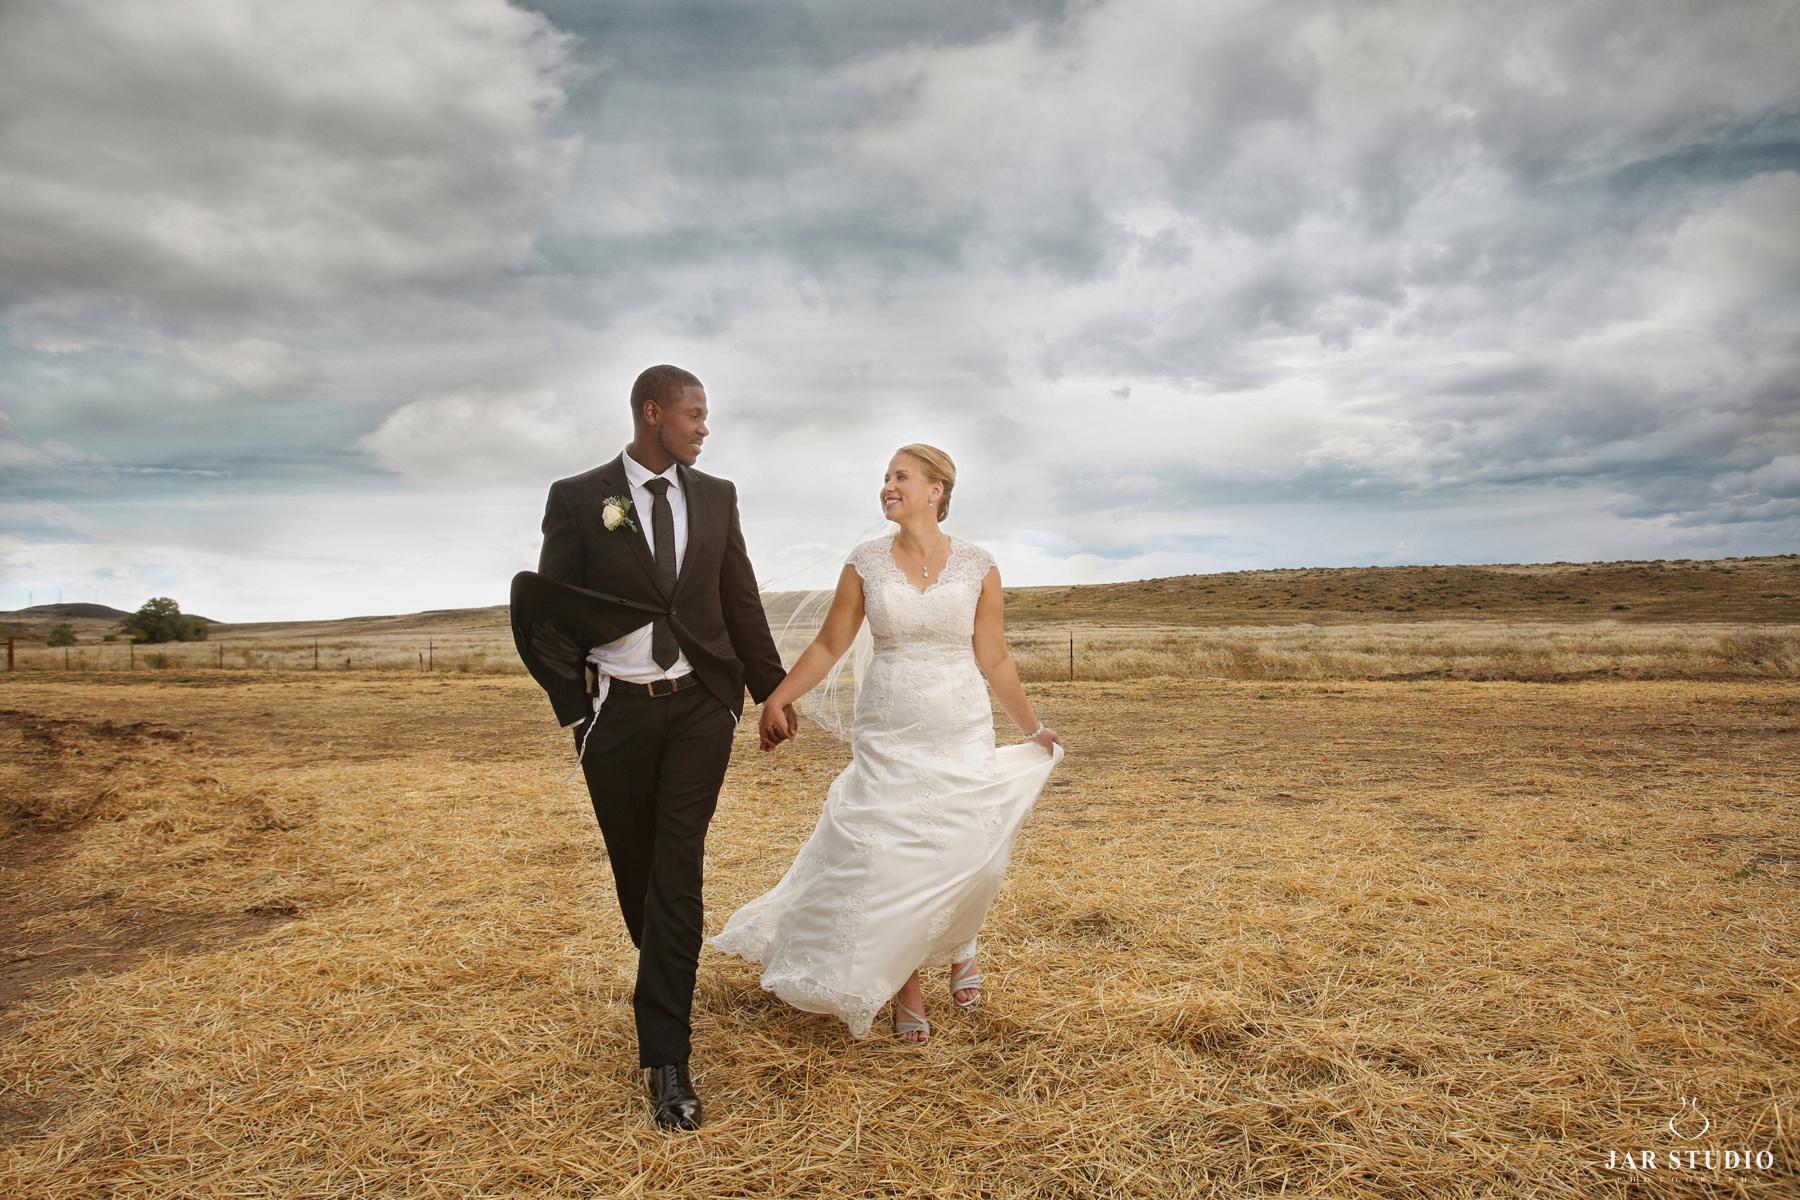 25-bride-groom-fun-moment-real-wedding-jarstudio.jpg